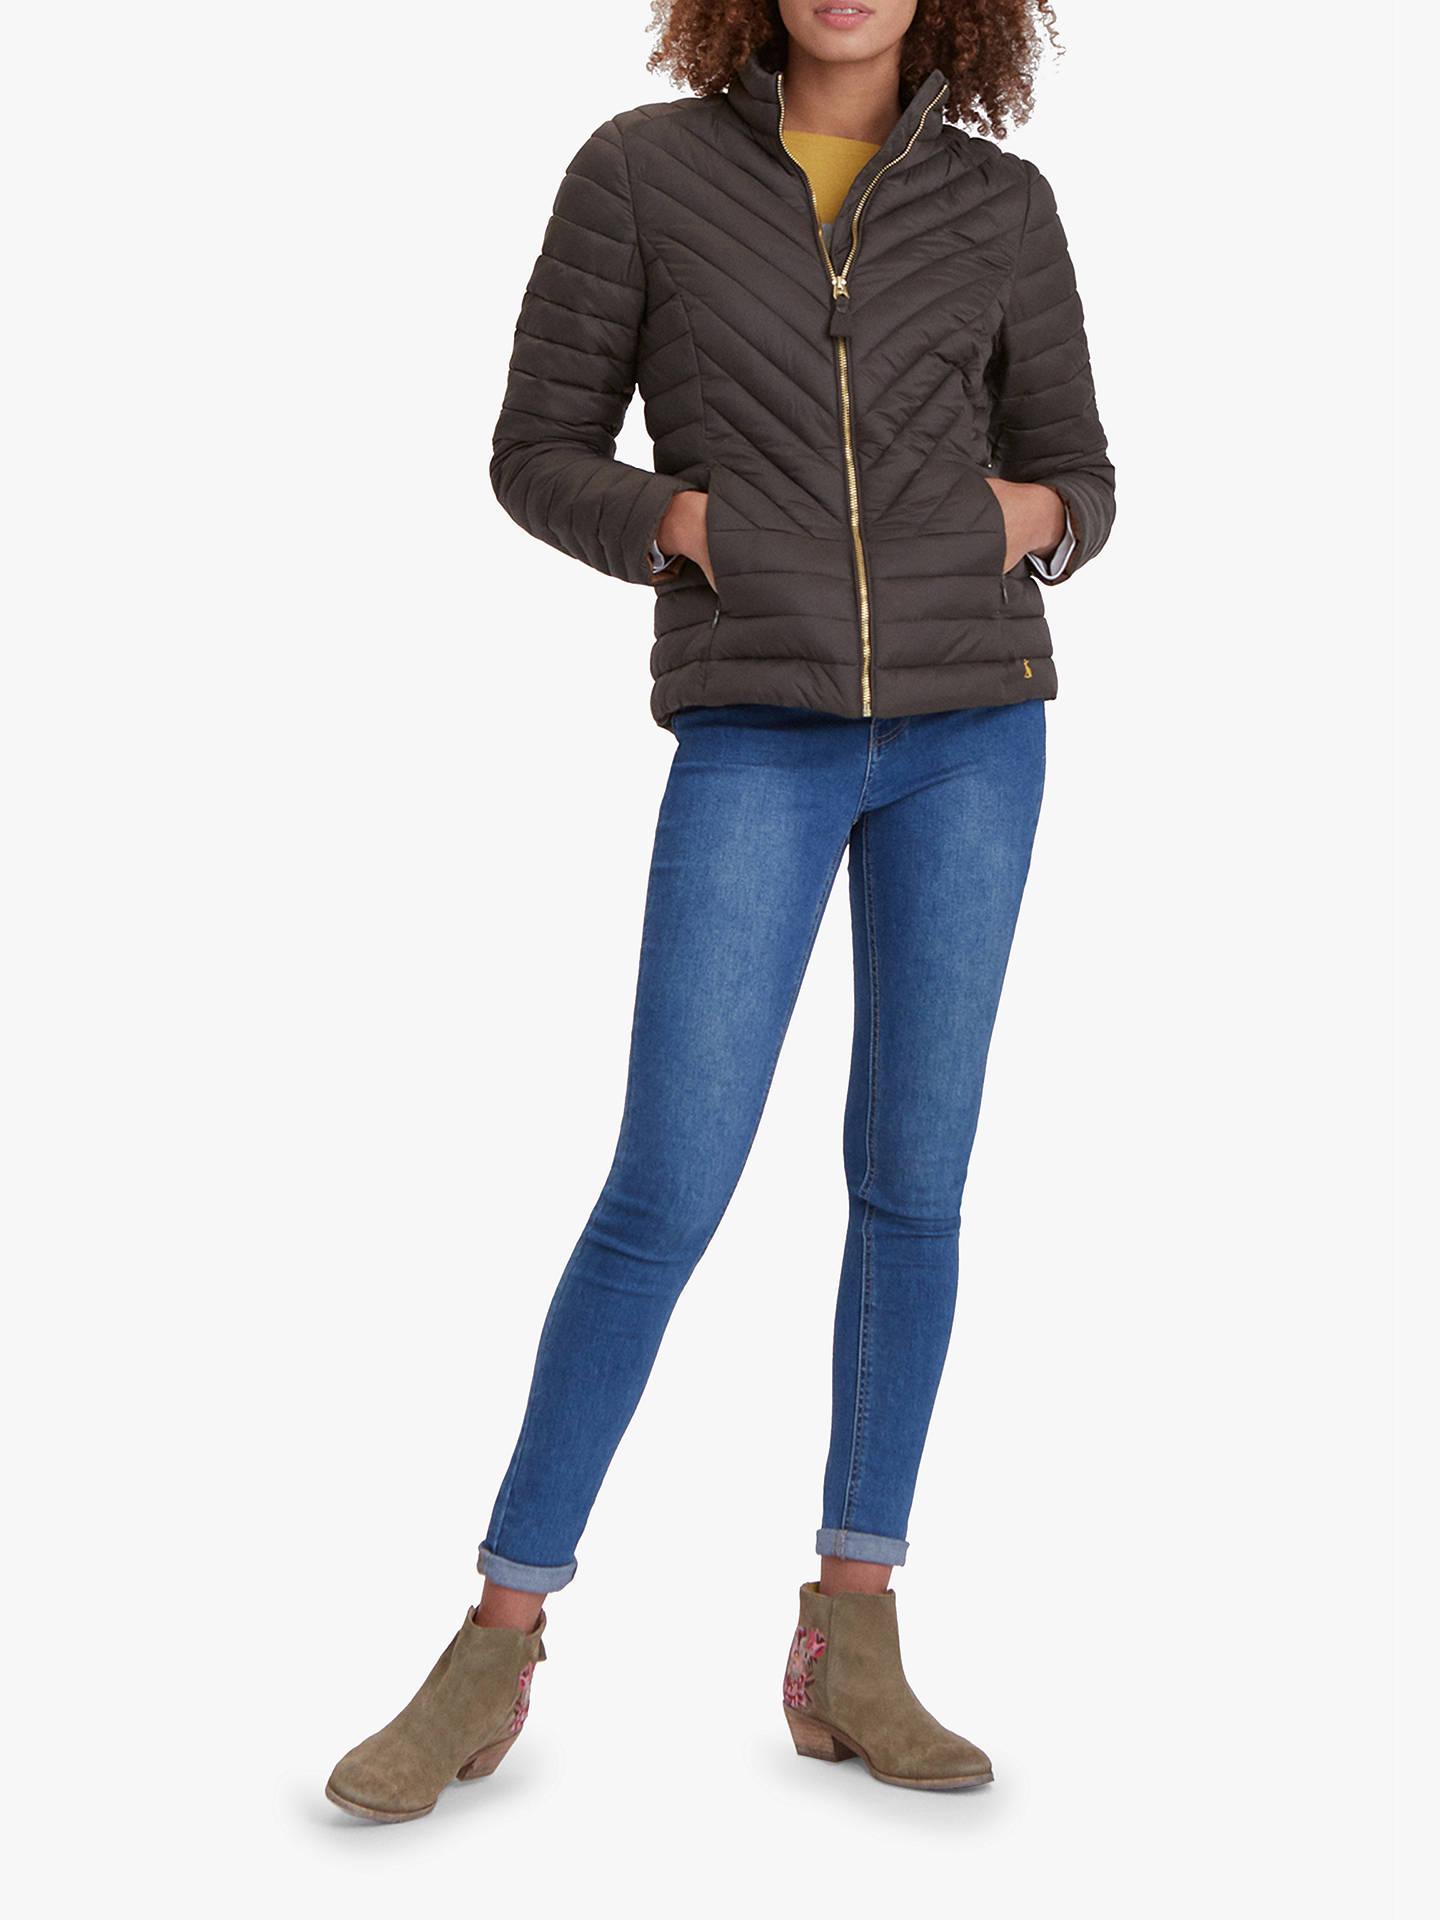 784bec50c Joules Elodie Chevron Jacket at John Lewis & Partners